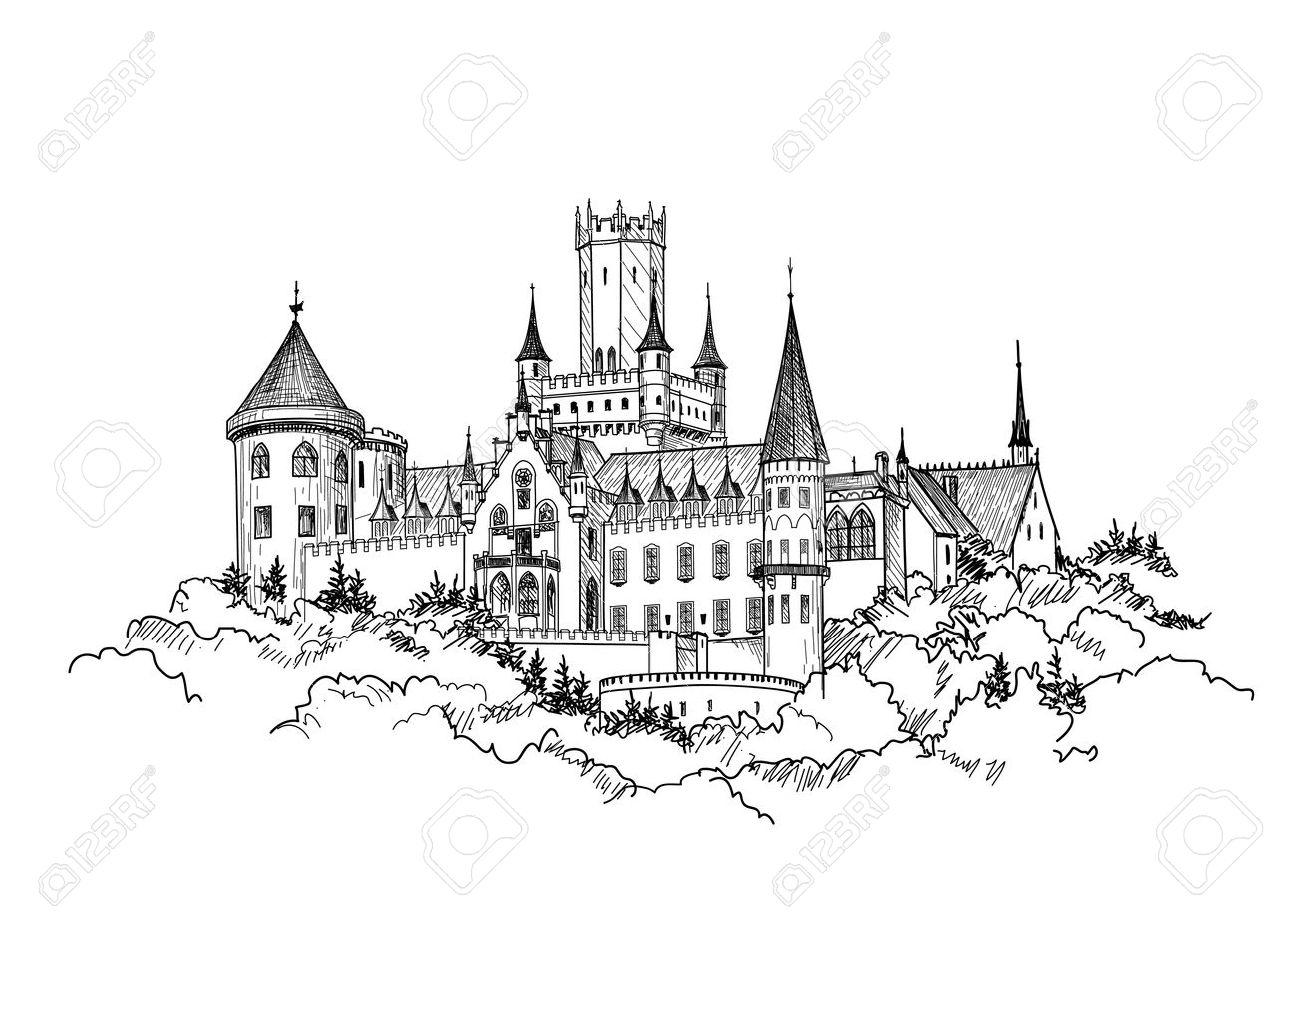 Famous Castle Marienburg, Saxony, Germany. Castle building landscape. Hand drawn sketch vector illustration. Stock Vector - 58635719